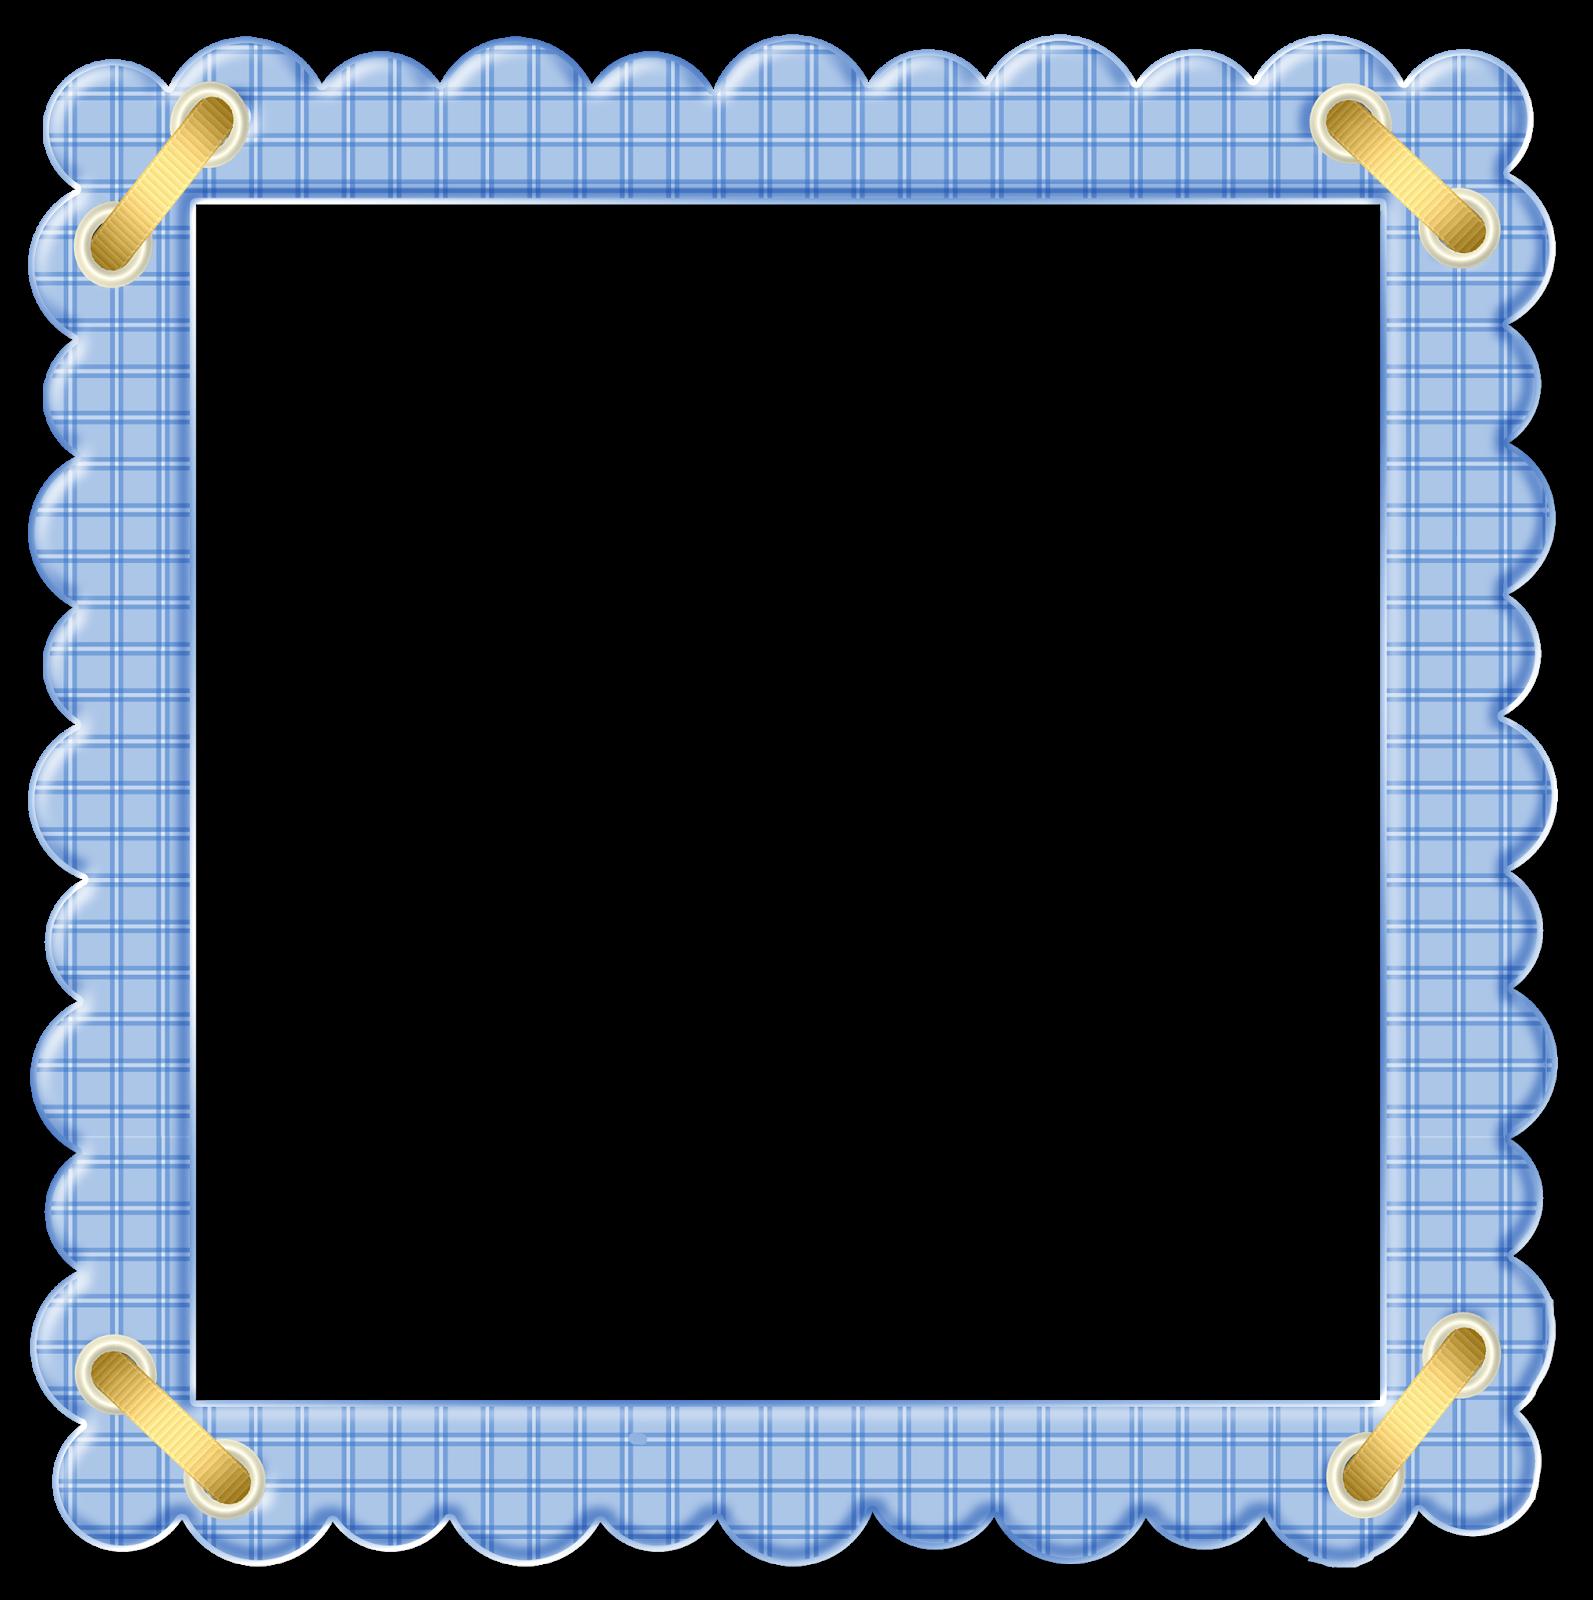 Картинки детские на белом фоне в рамке